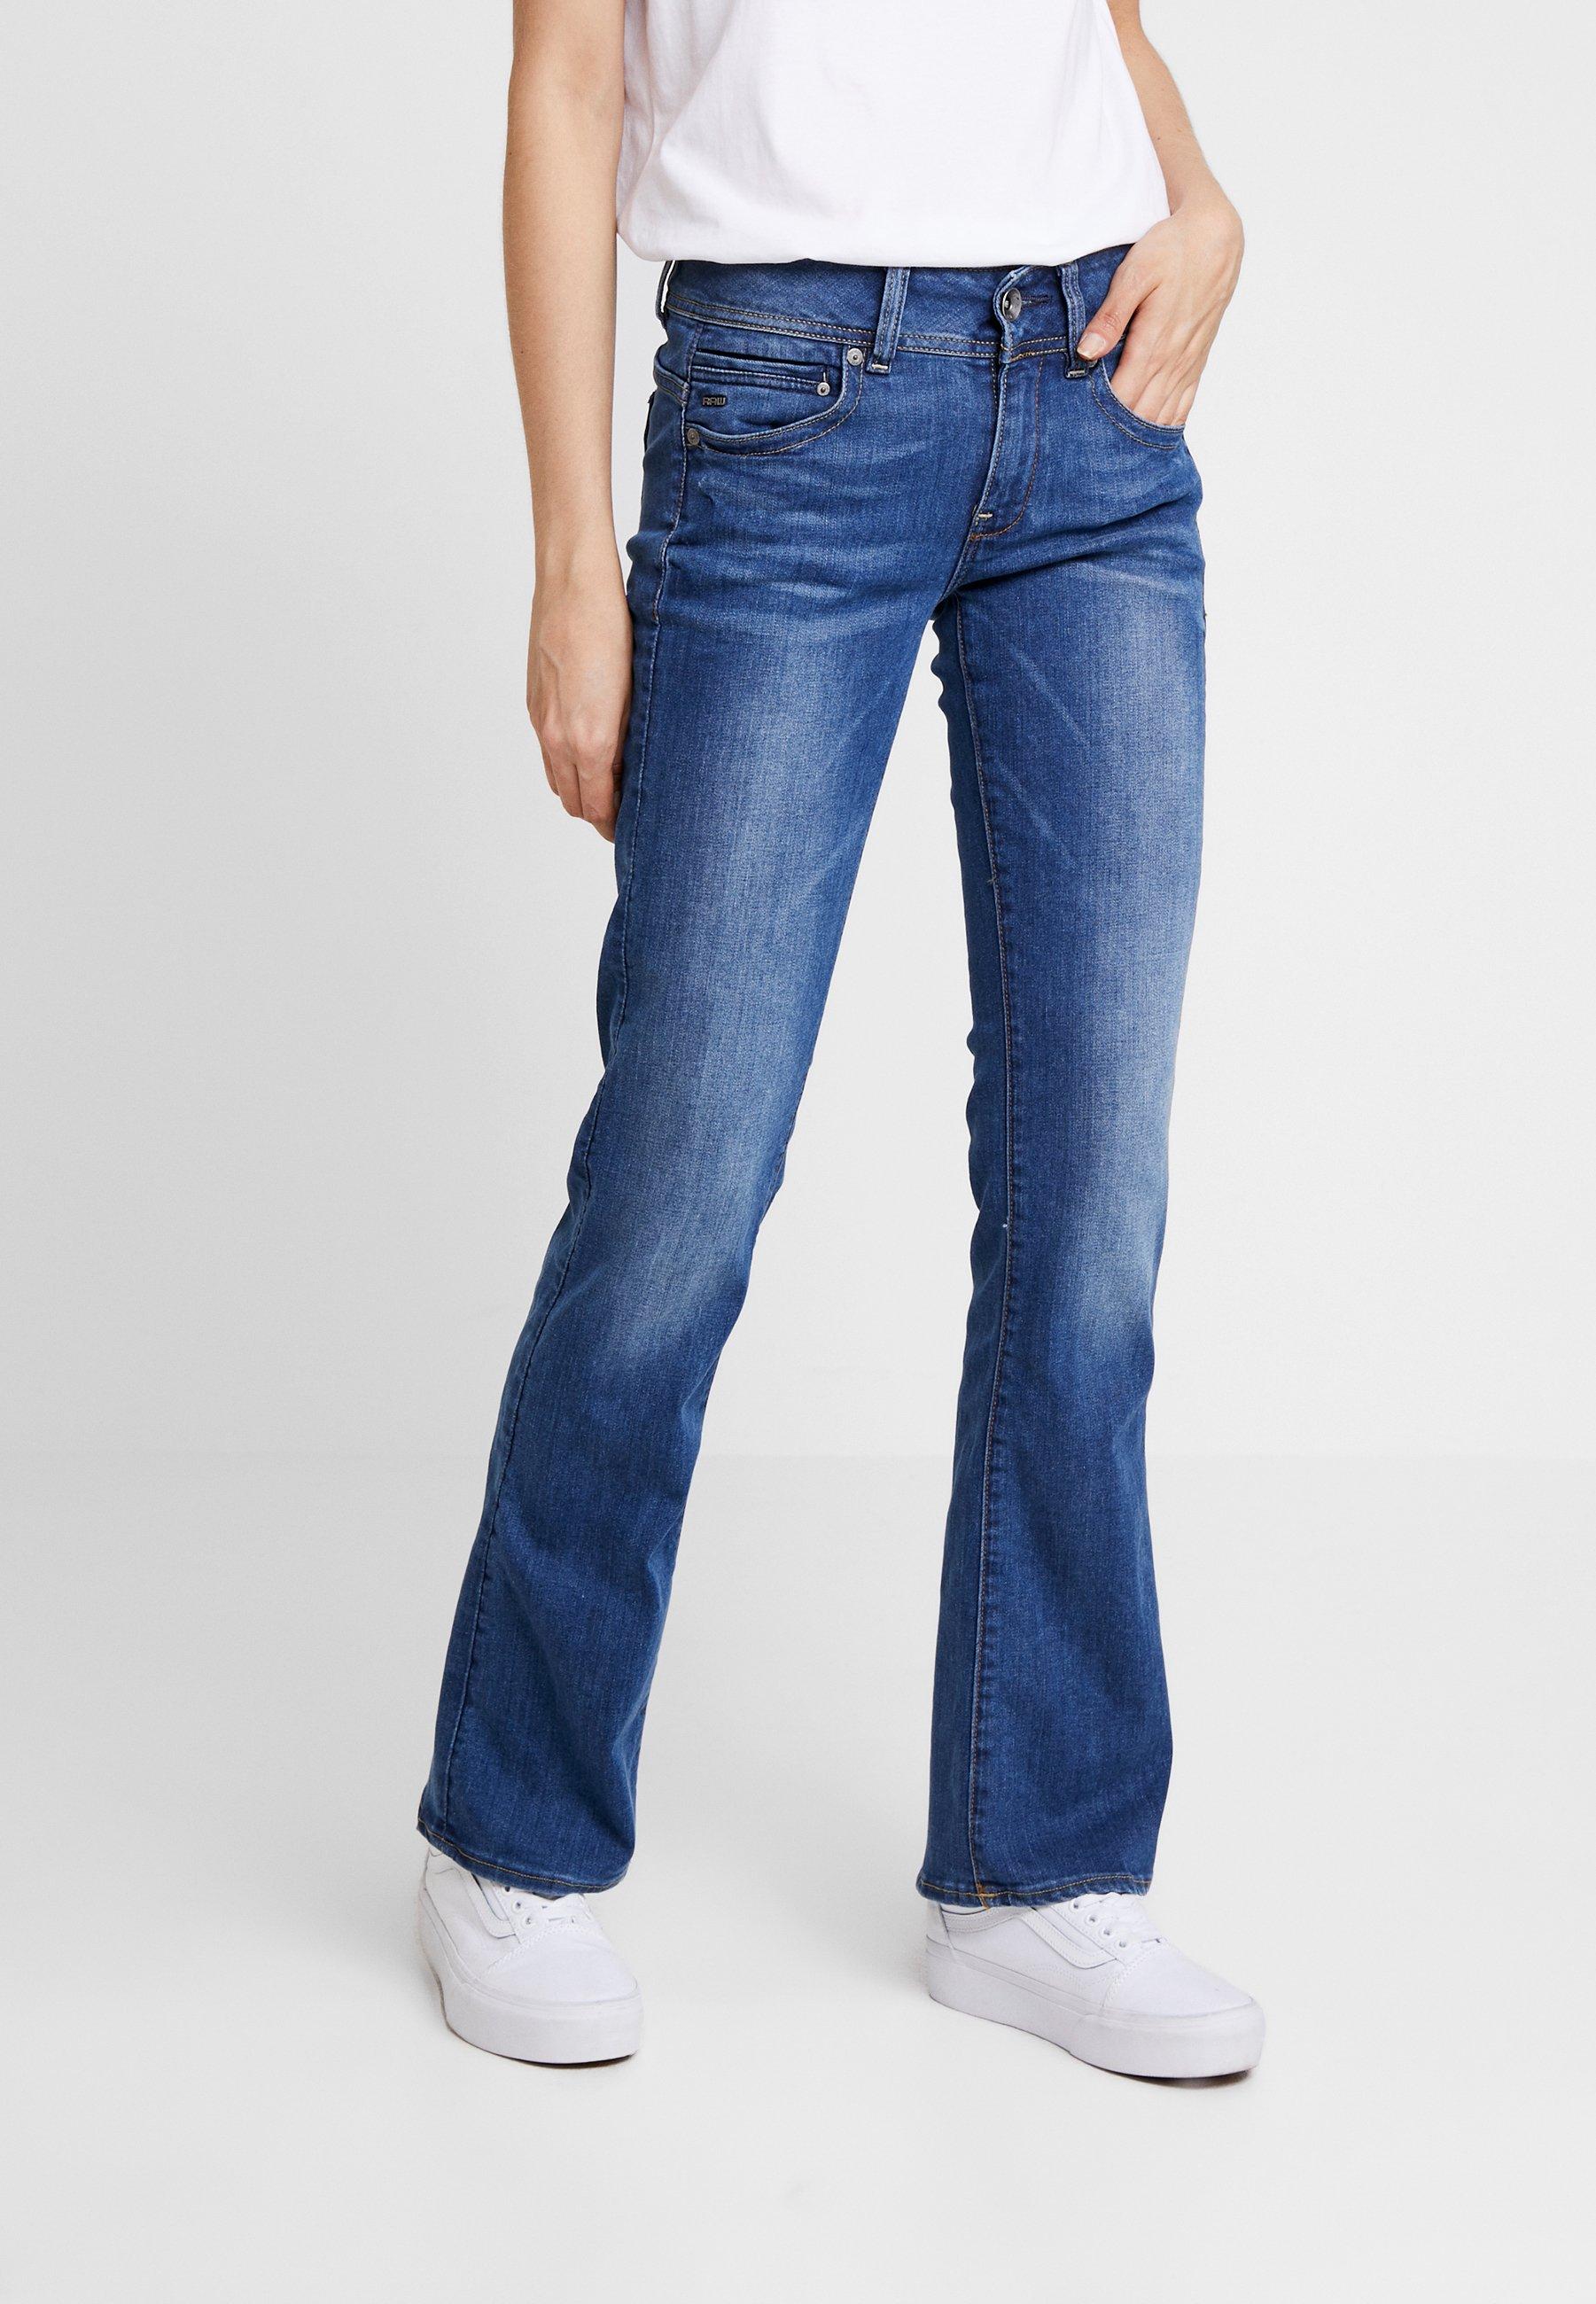 Femme MIDGE MID BOOTCUT   - Jean bootcut